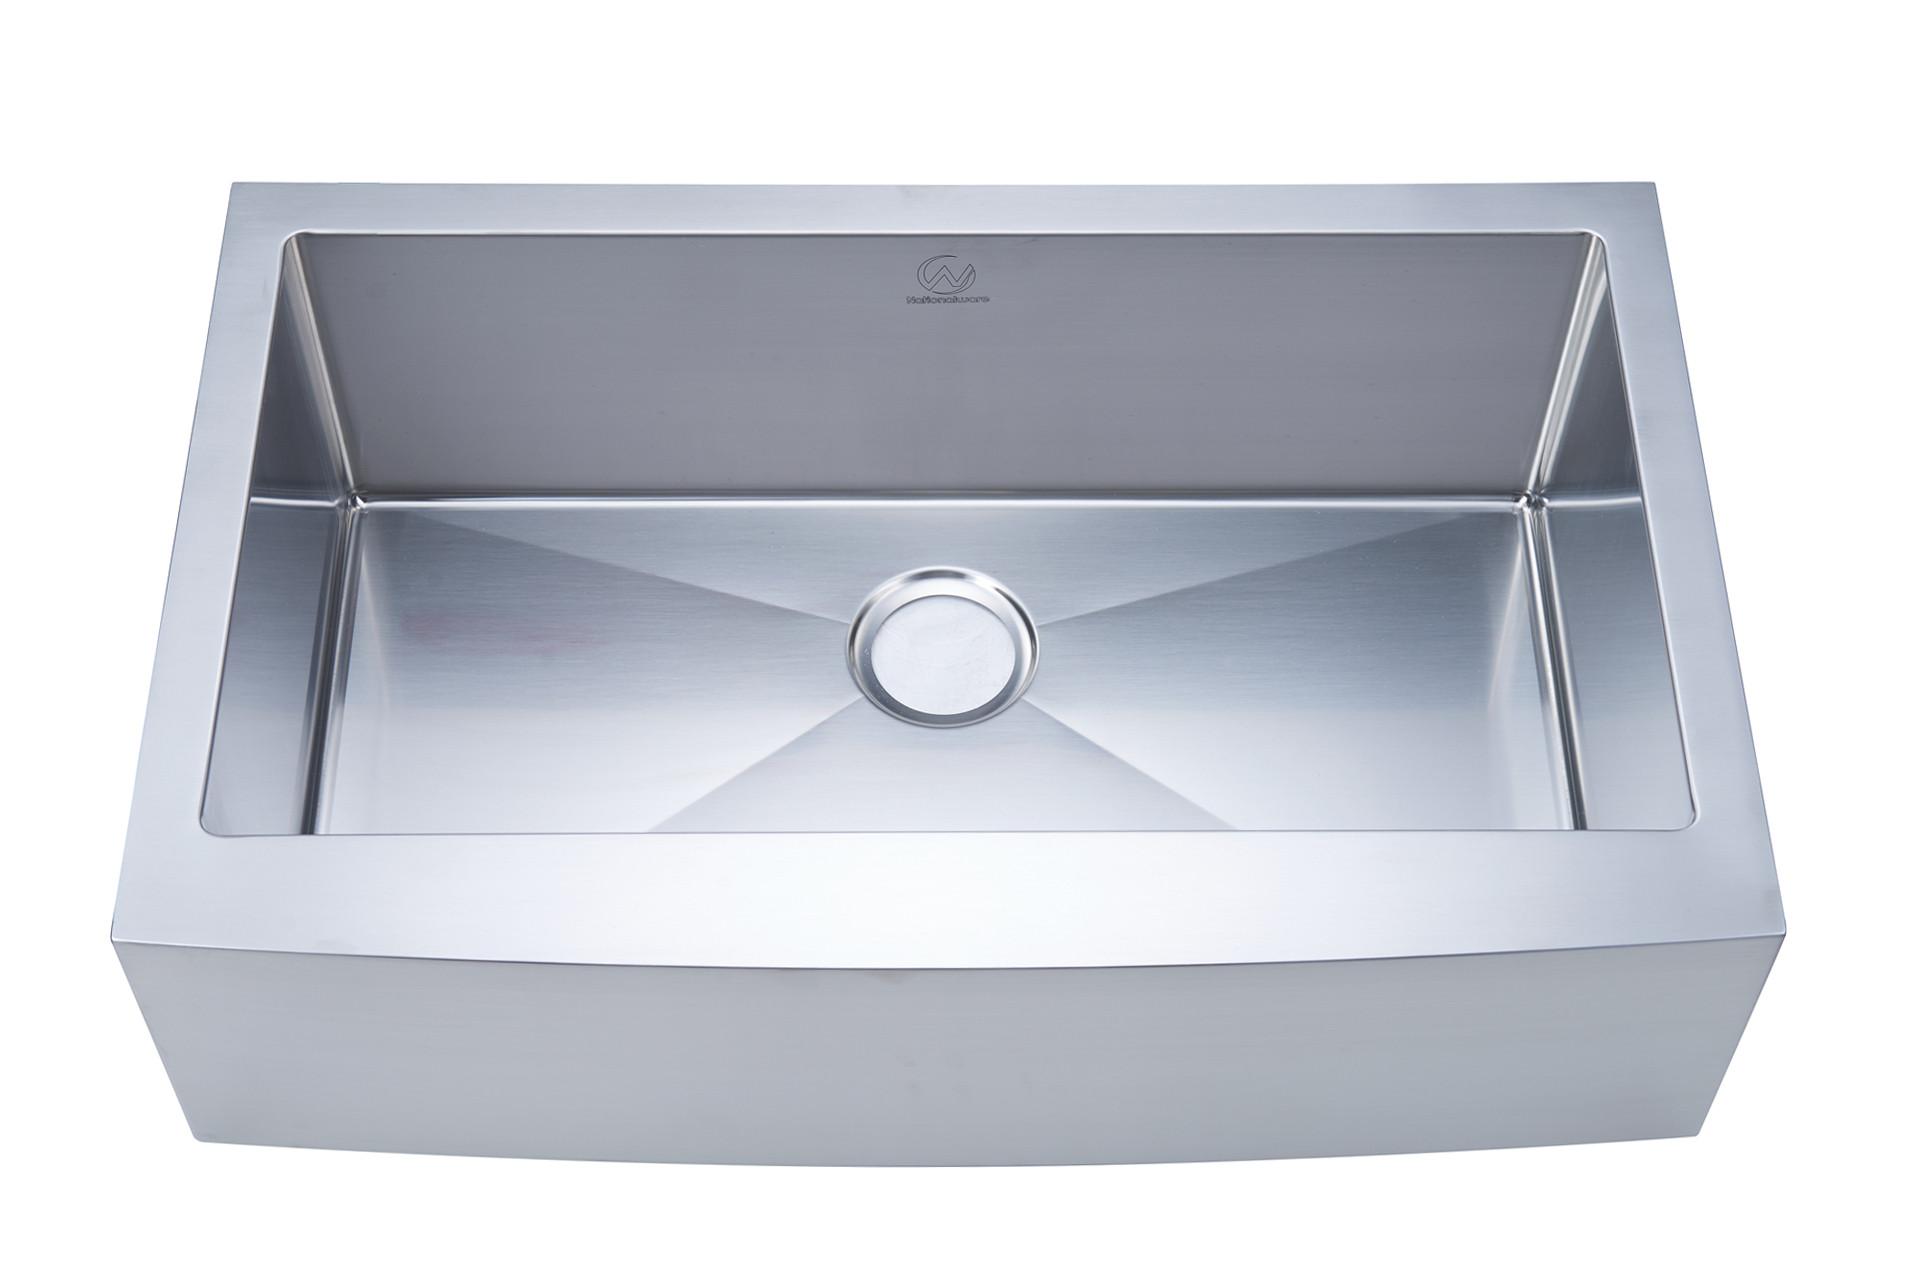 Stufurhome NW-3321S Apron/Farmhouse Stainless Steel 33 Inch Single Bowl Kitchen Sink